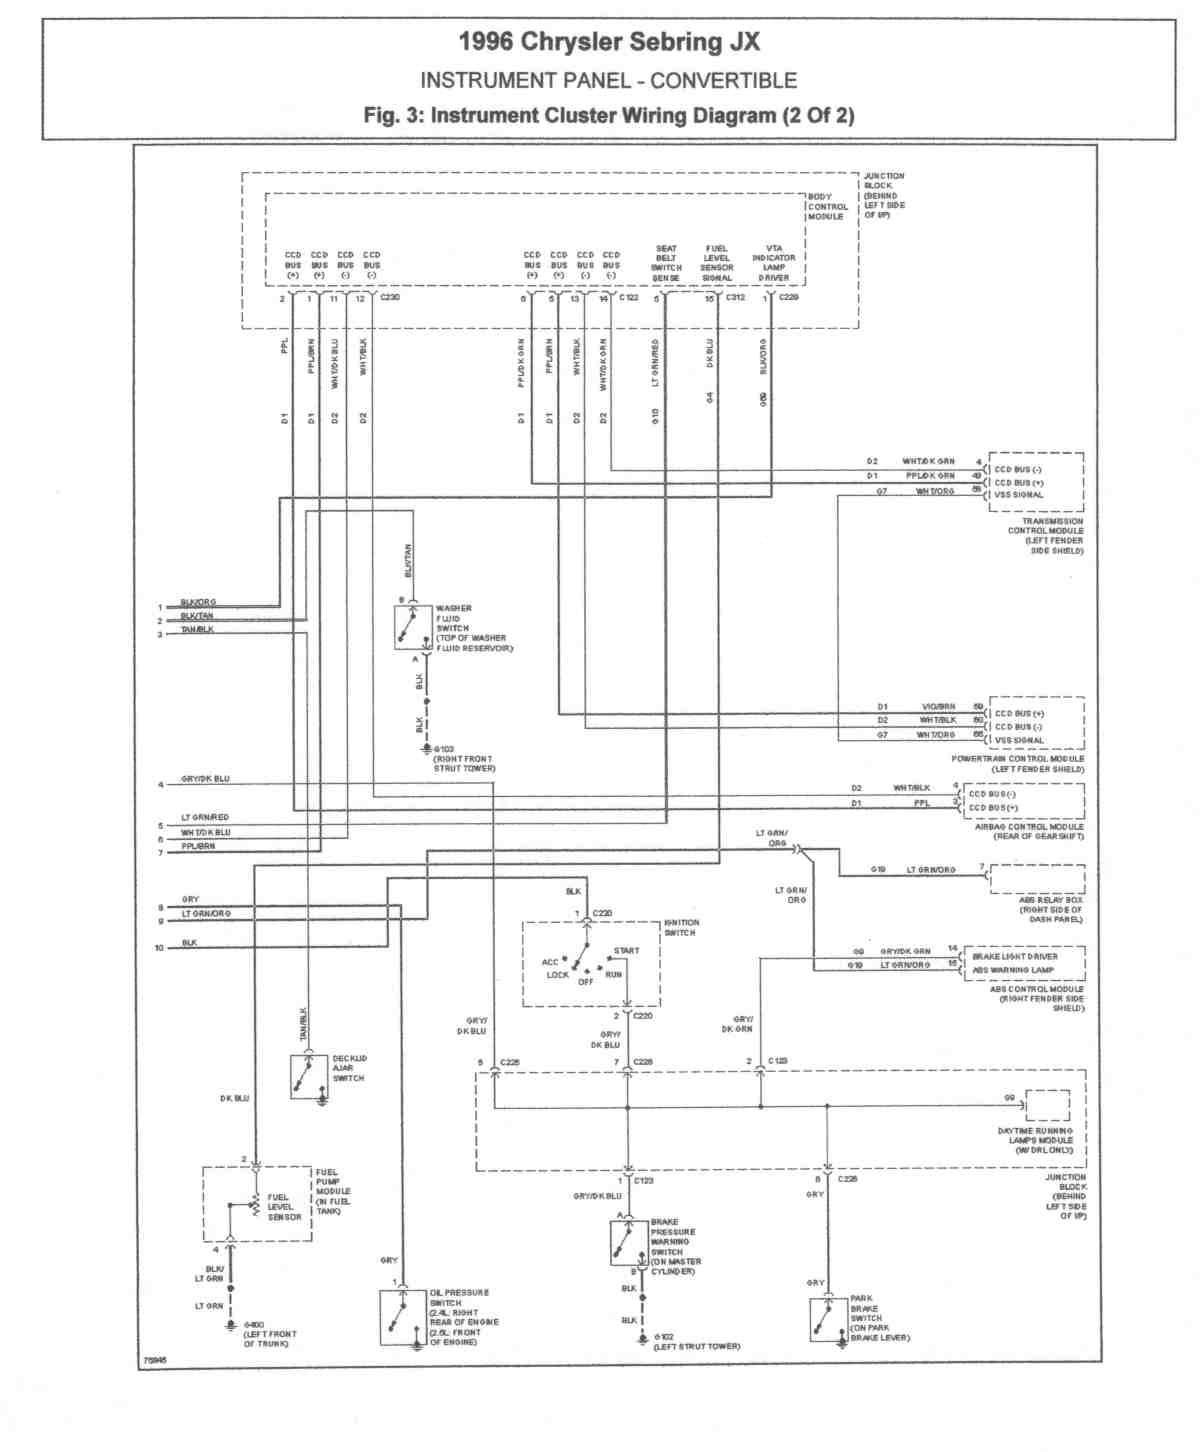 2004 Chrysler Sebring Wiring Diagram Full Hd Version Wiring Diagram Shin Yti Fr